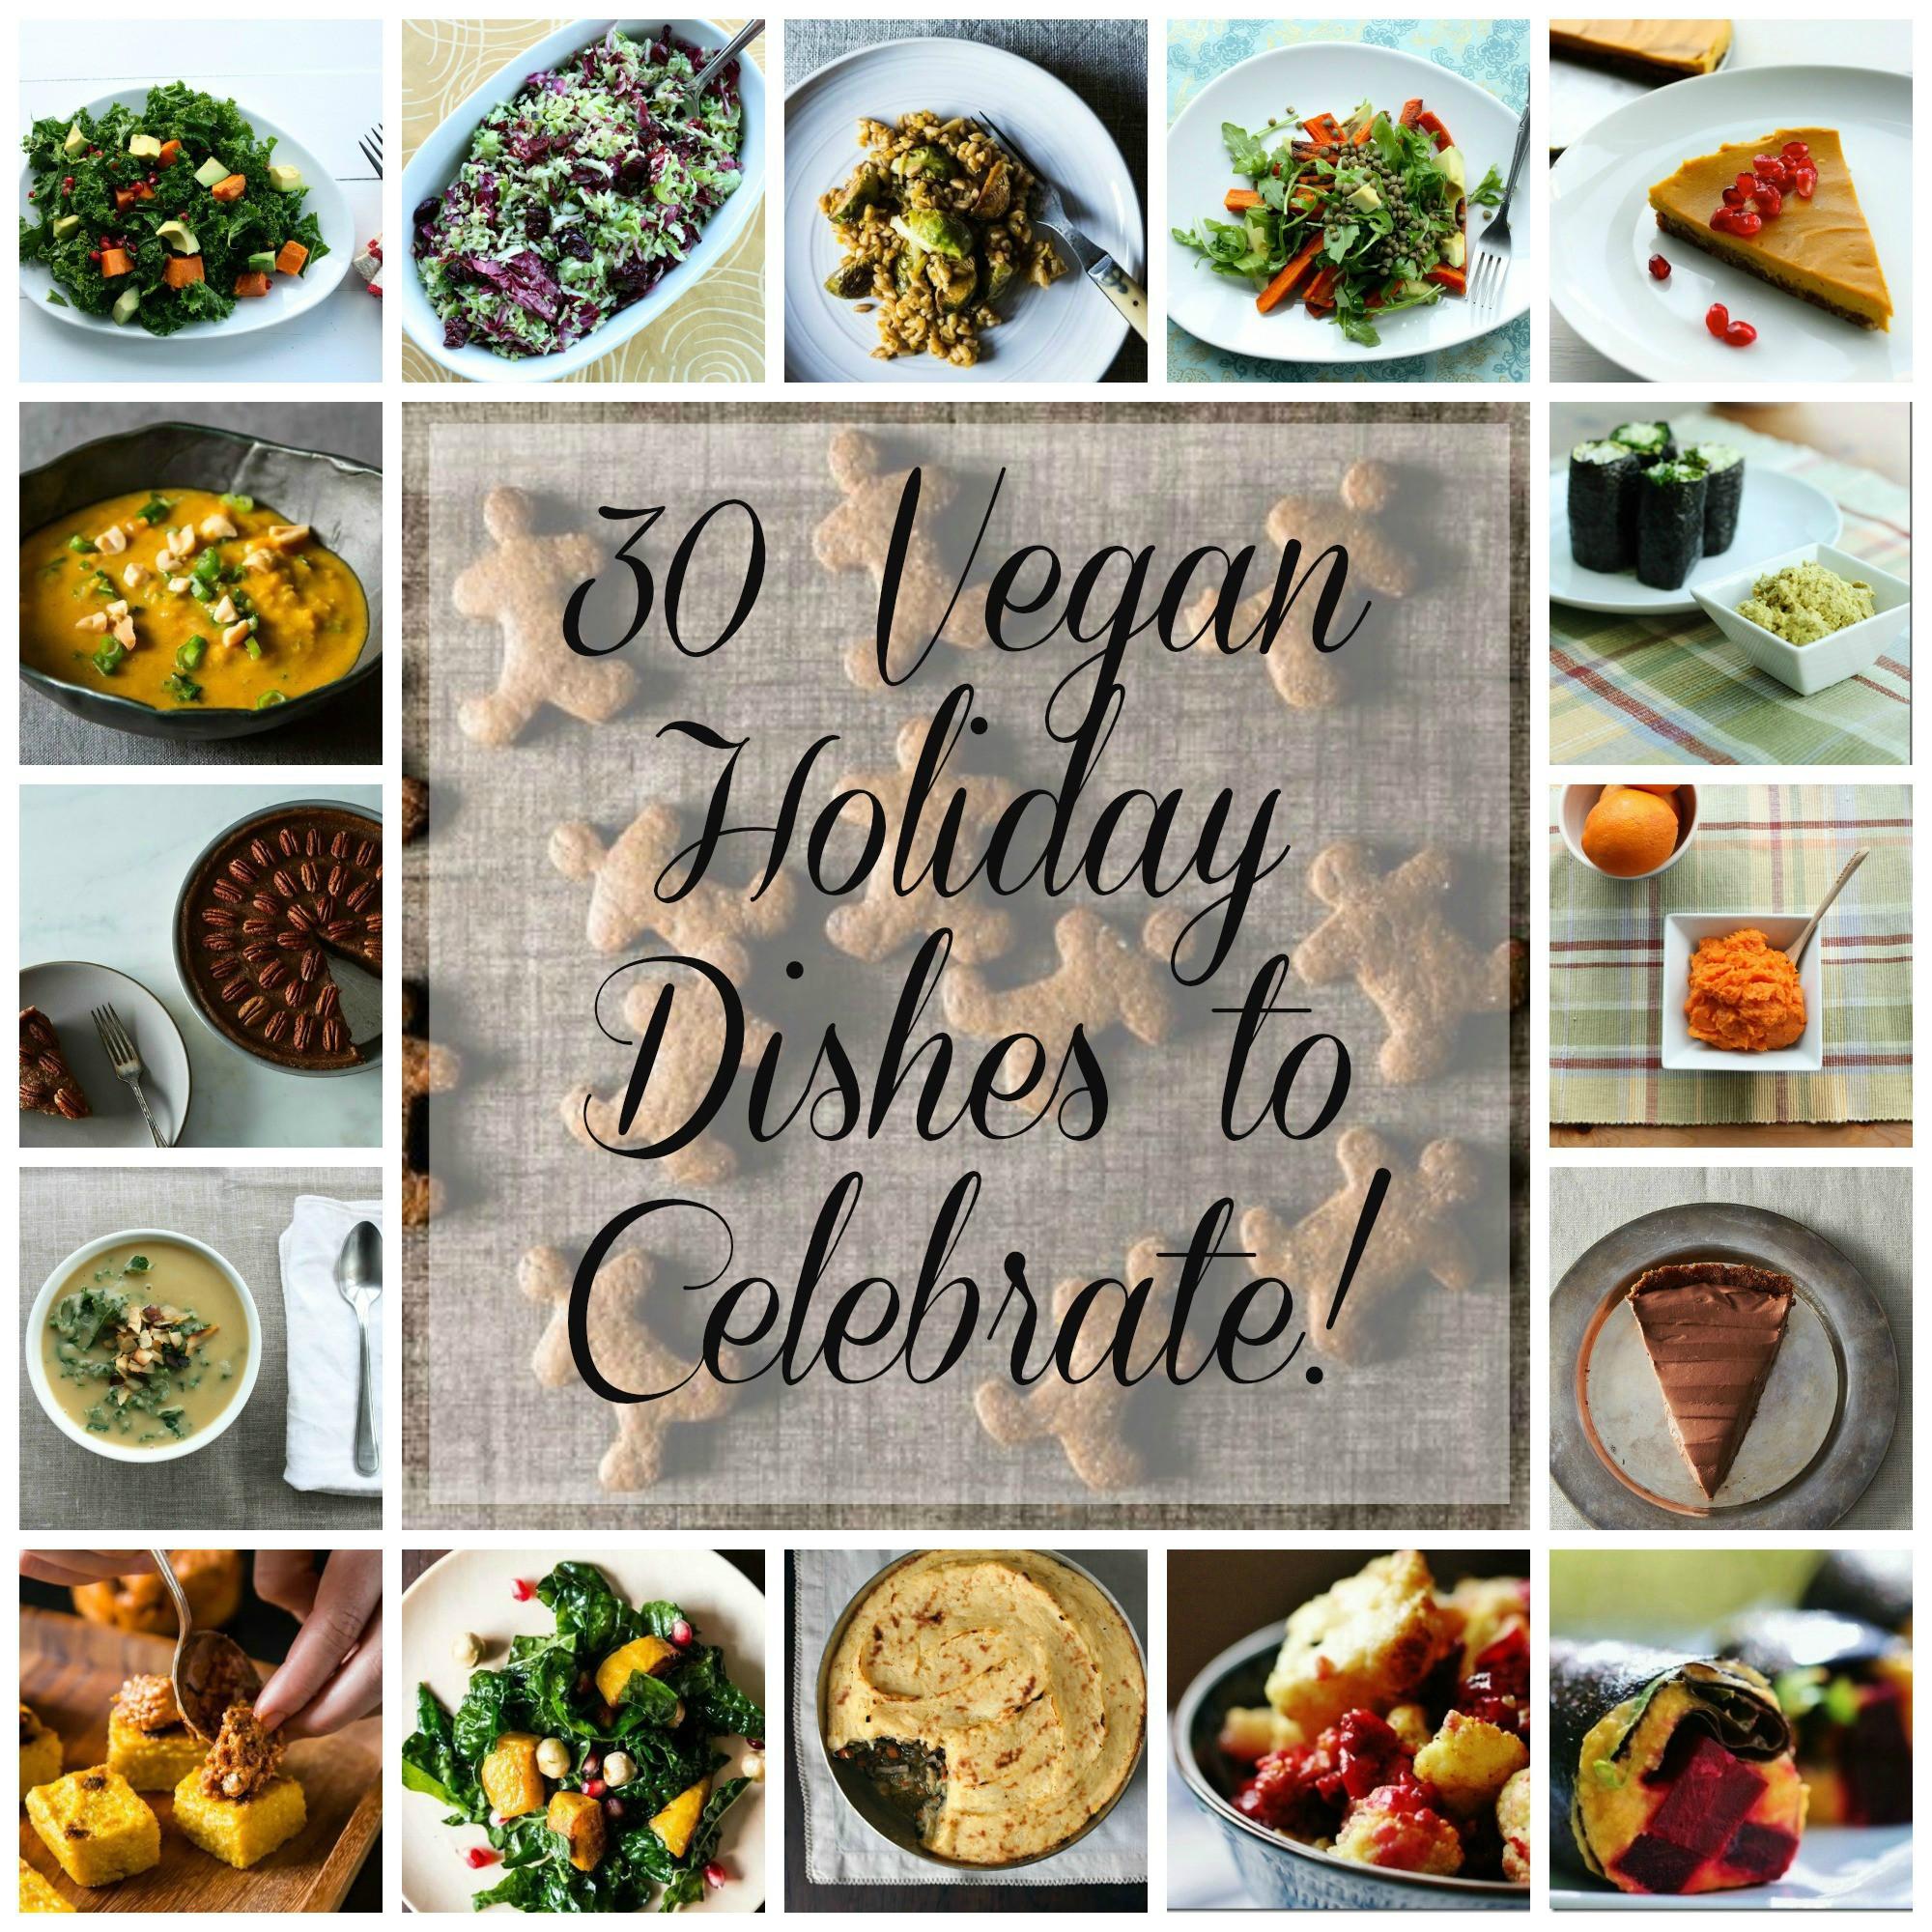 Vegan Holiday Recipes  2013 Vegan Holiday Recipe Round Up 30 Appetizers Salads